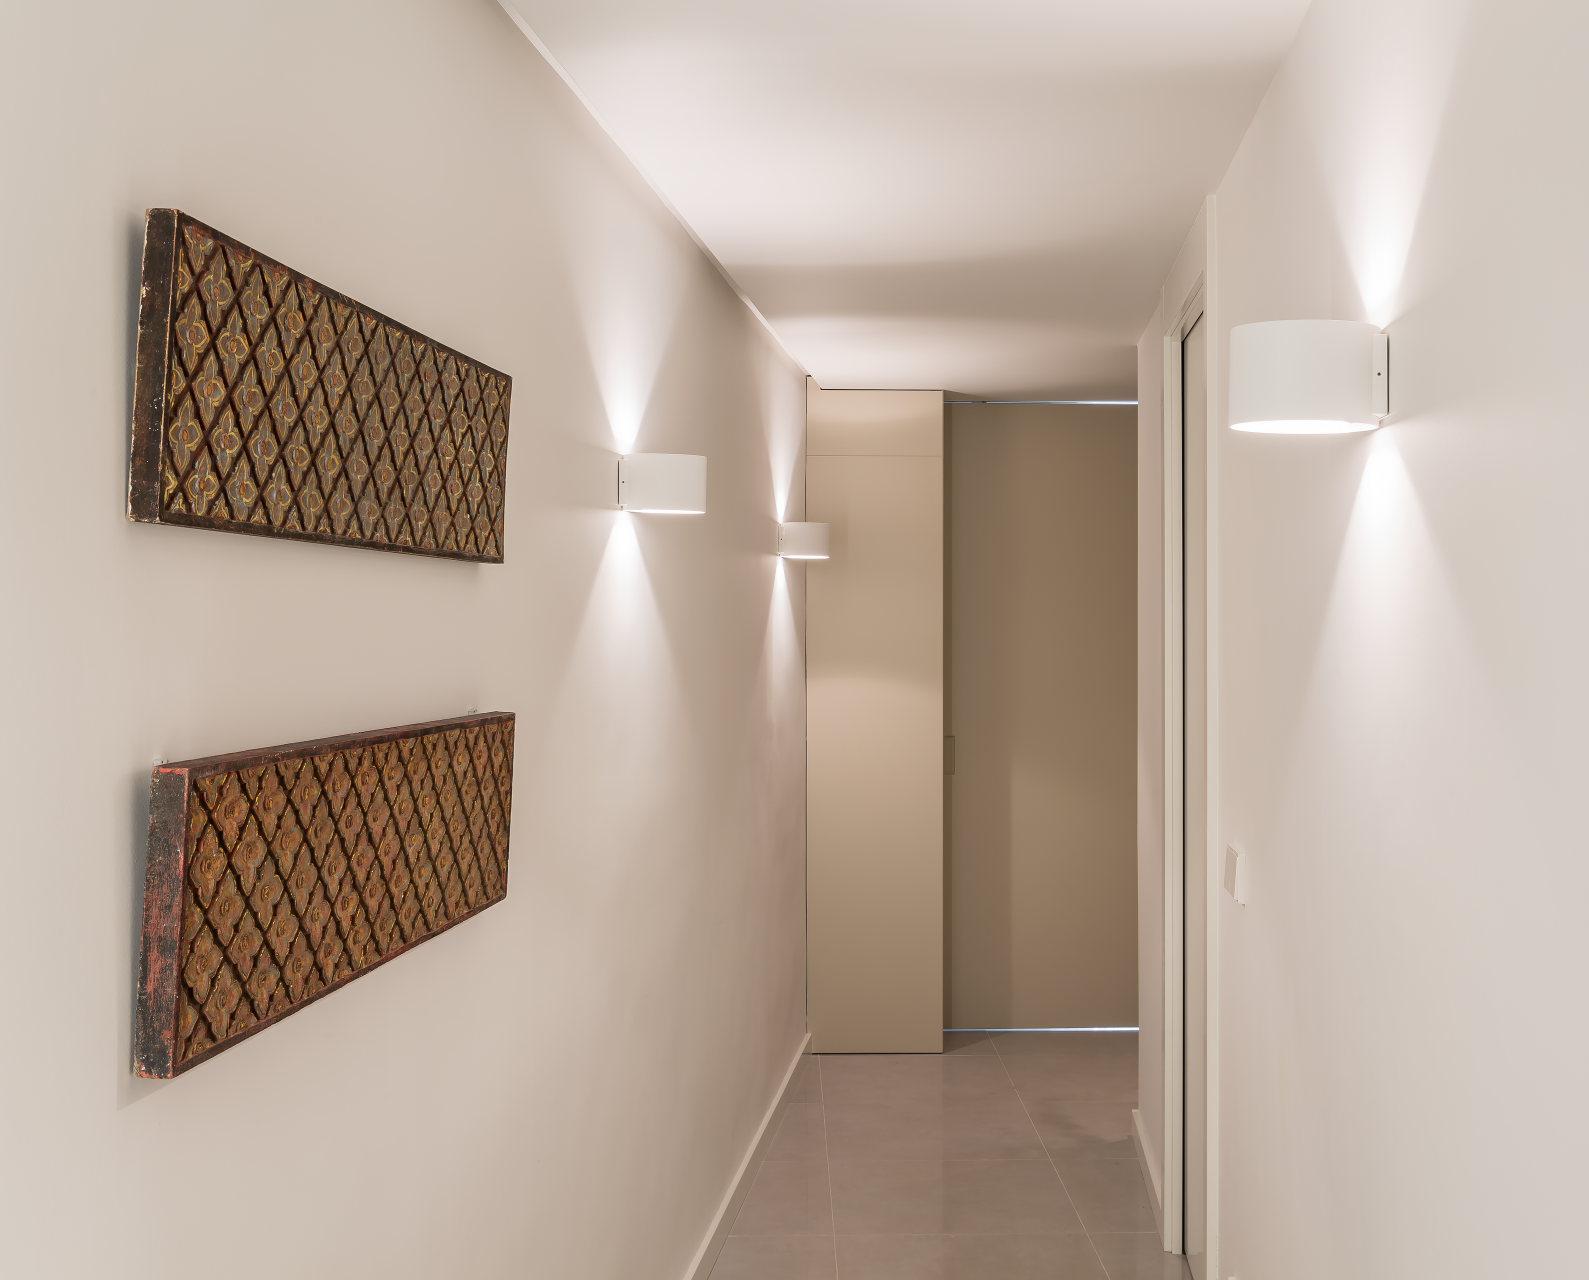 fotografia-arquitectura-interiorismo-valencia-fenollar-german-cabo-laura-yerpes  (10)